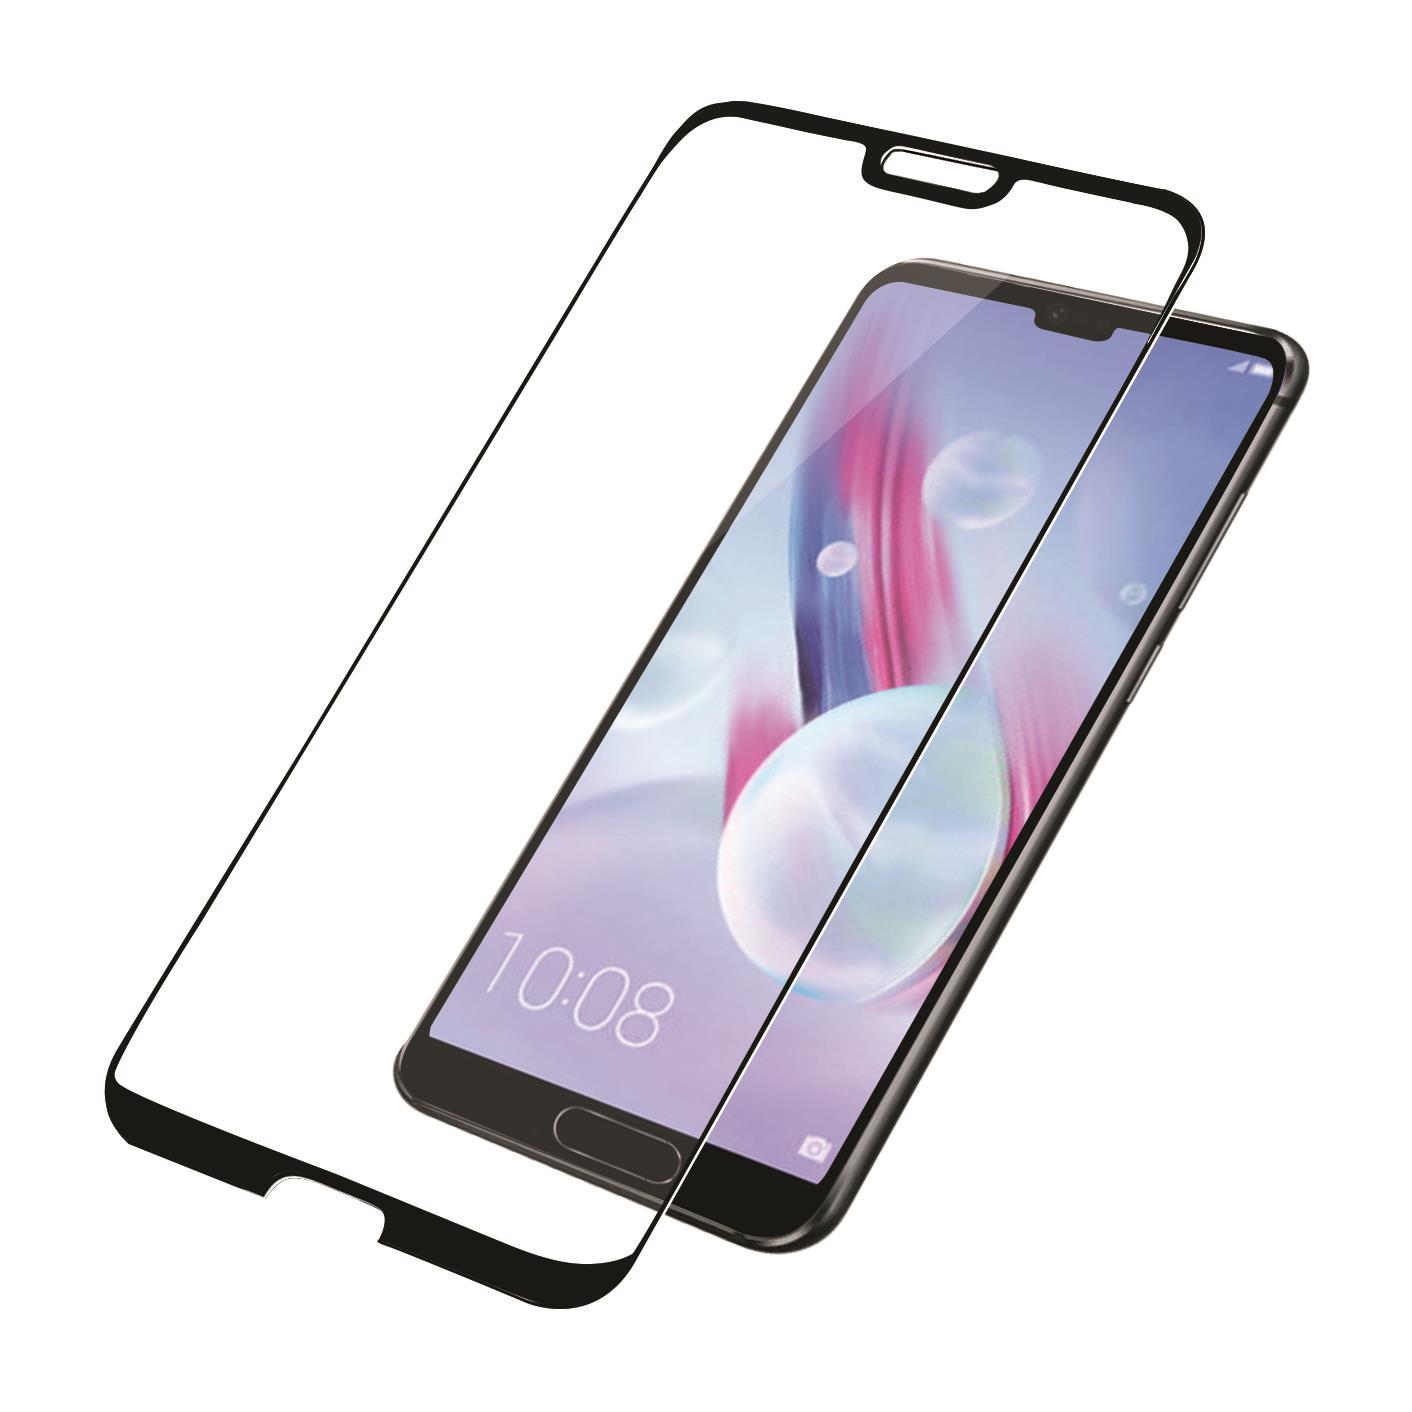 Ochranné sklo displeje PanzerGlass Edge to Edge pro Huawei P20, black